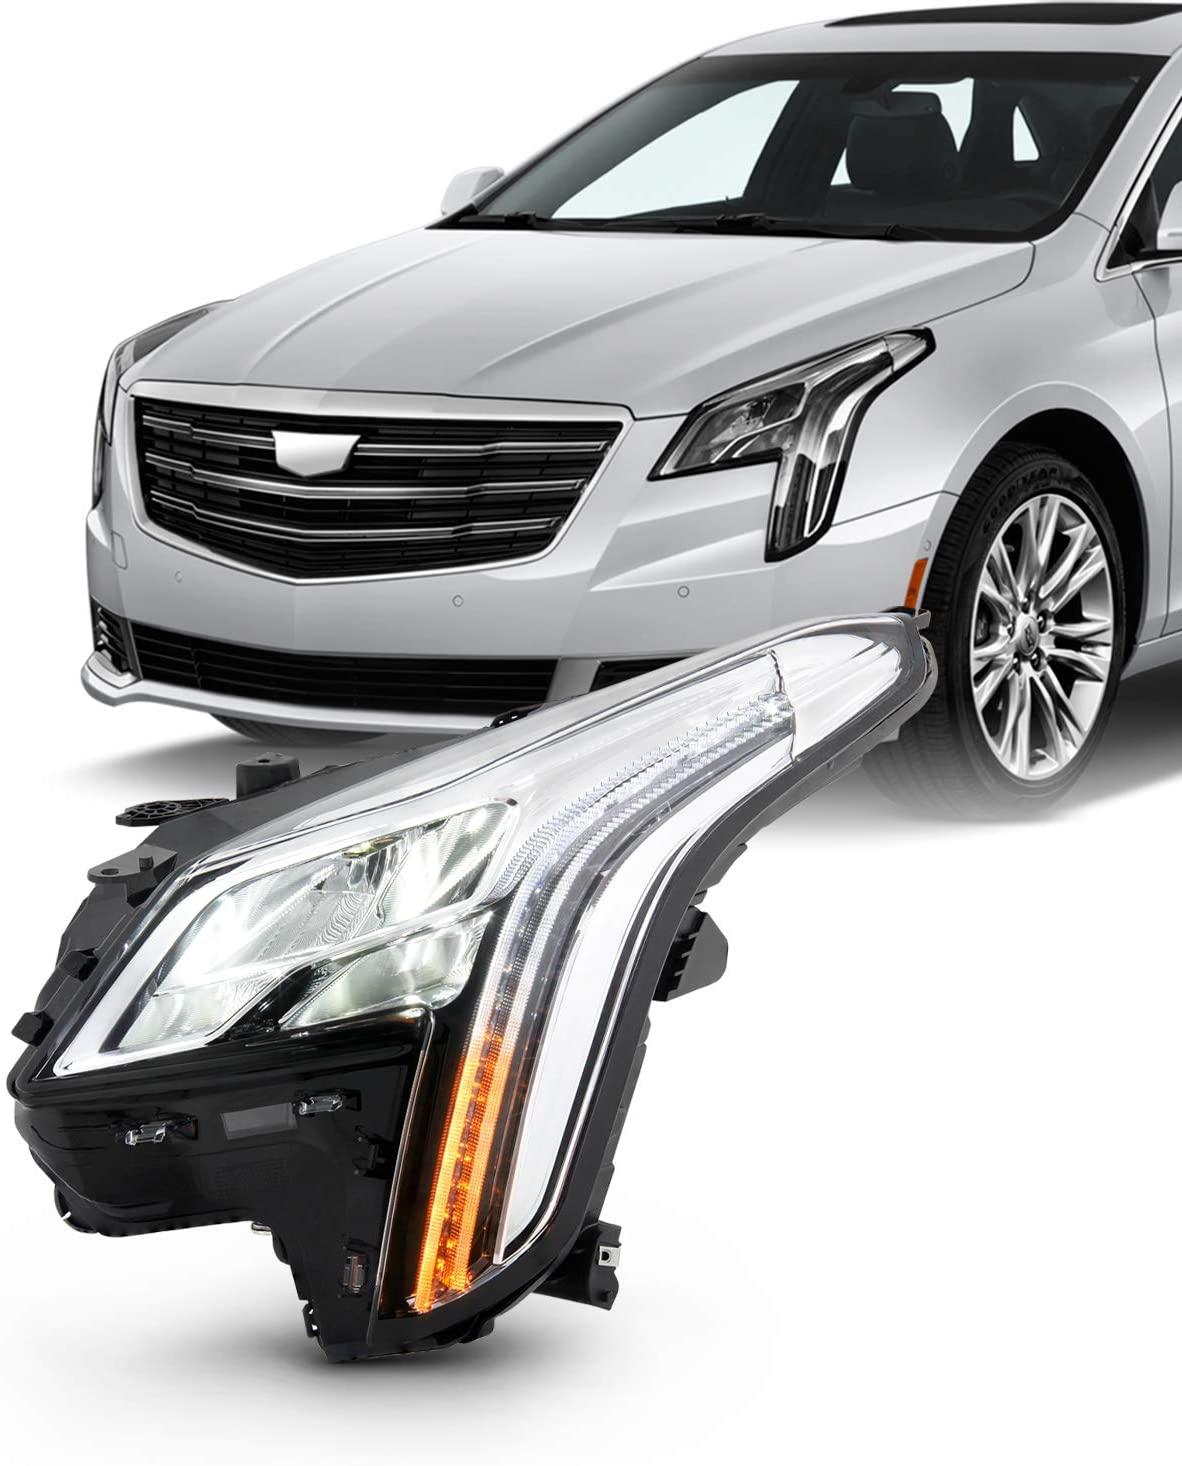 Fits 2018 2019 Cadillac XTS Sedan 4Door LED DRL Tube Bar Projector Chrome Headlight Driver Left Headlamp Replacement